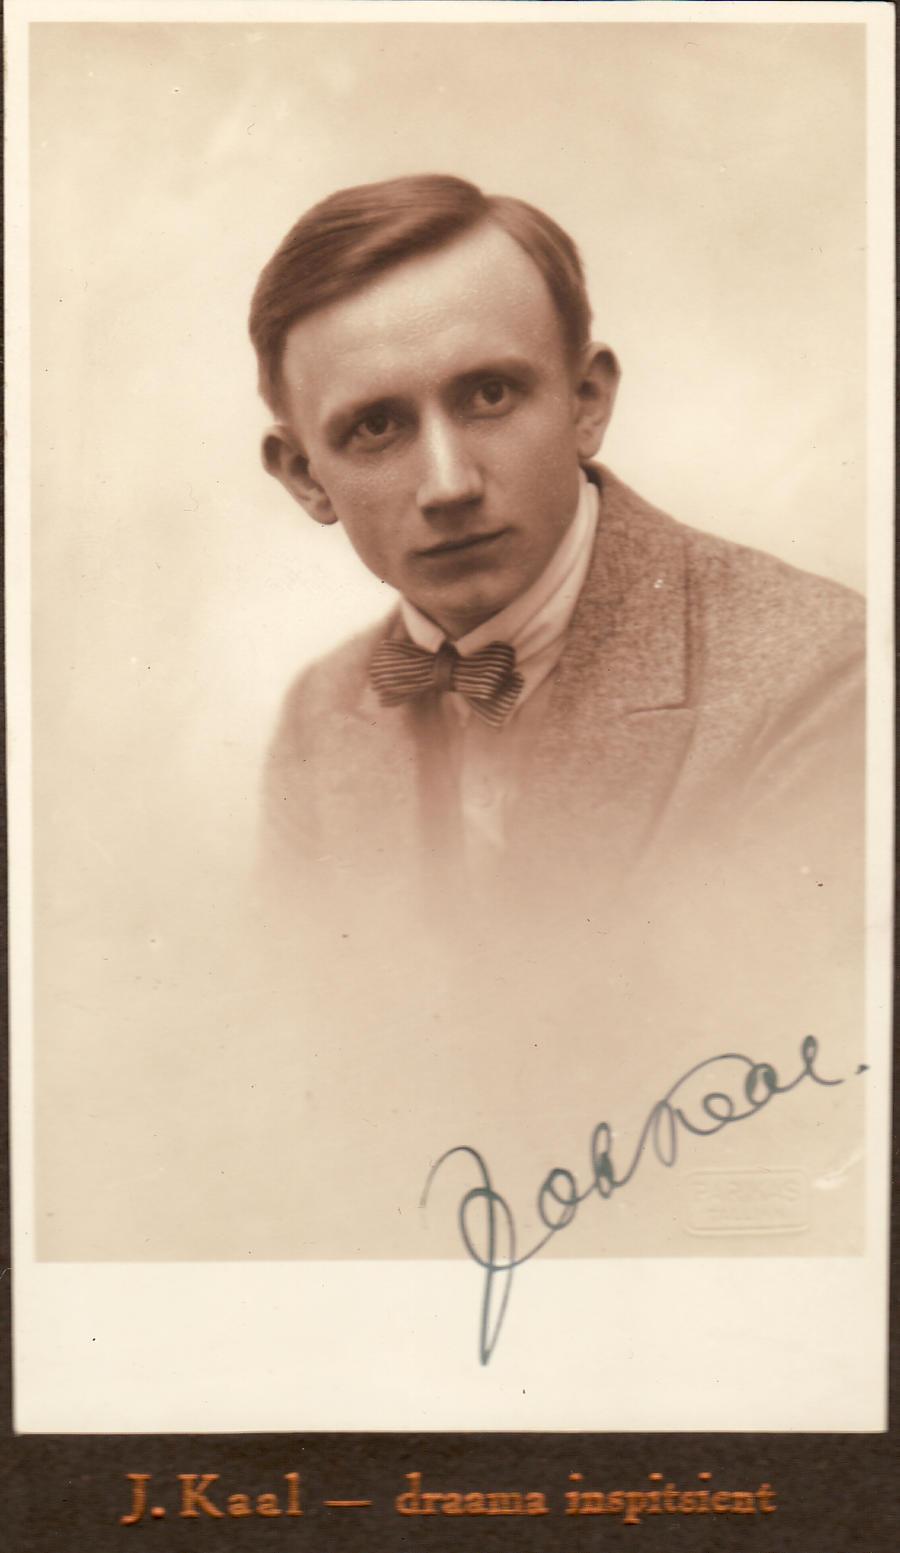 Johannes Kaal